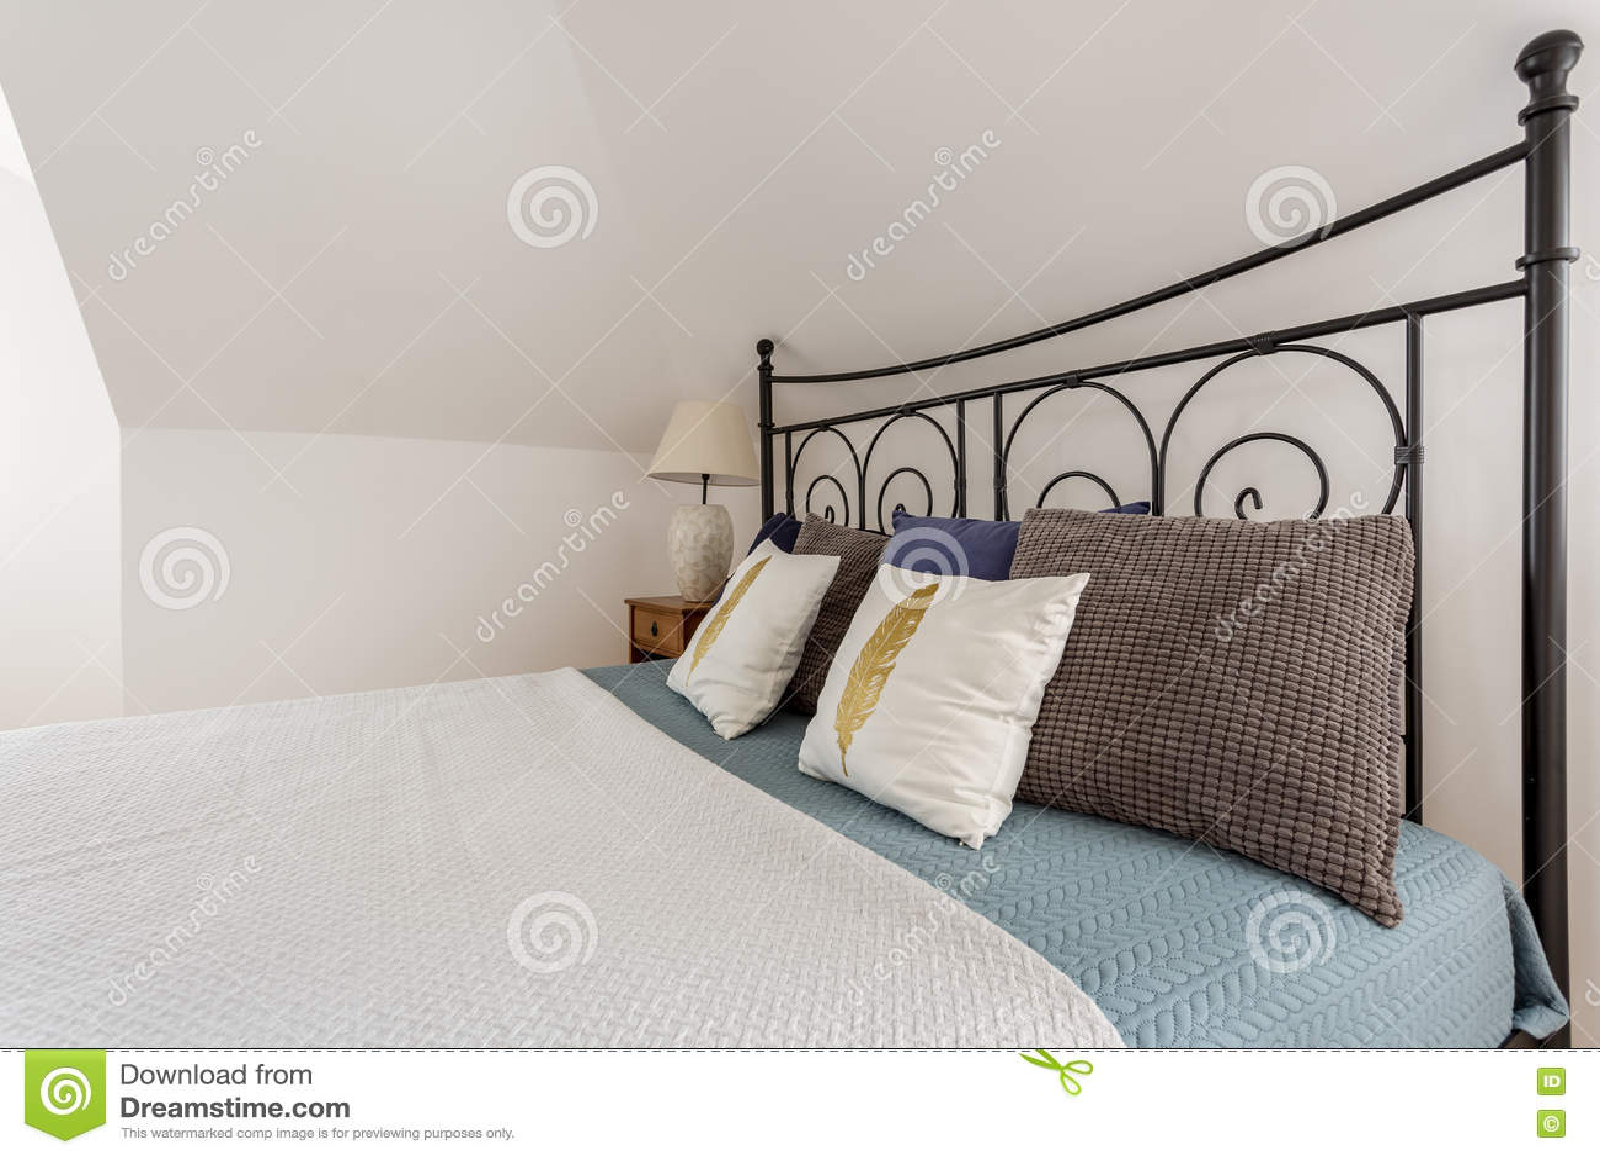 Decorative metal bed frame - Decorative Metal Bed Frame Idea Stock Photo